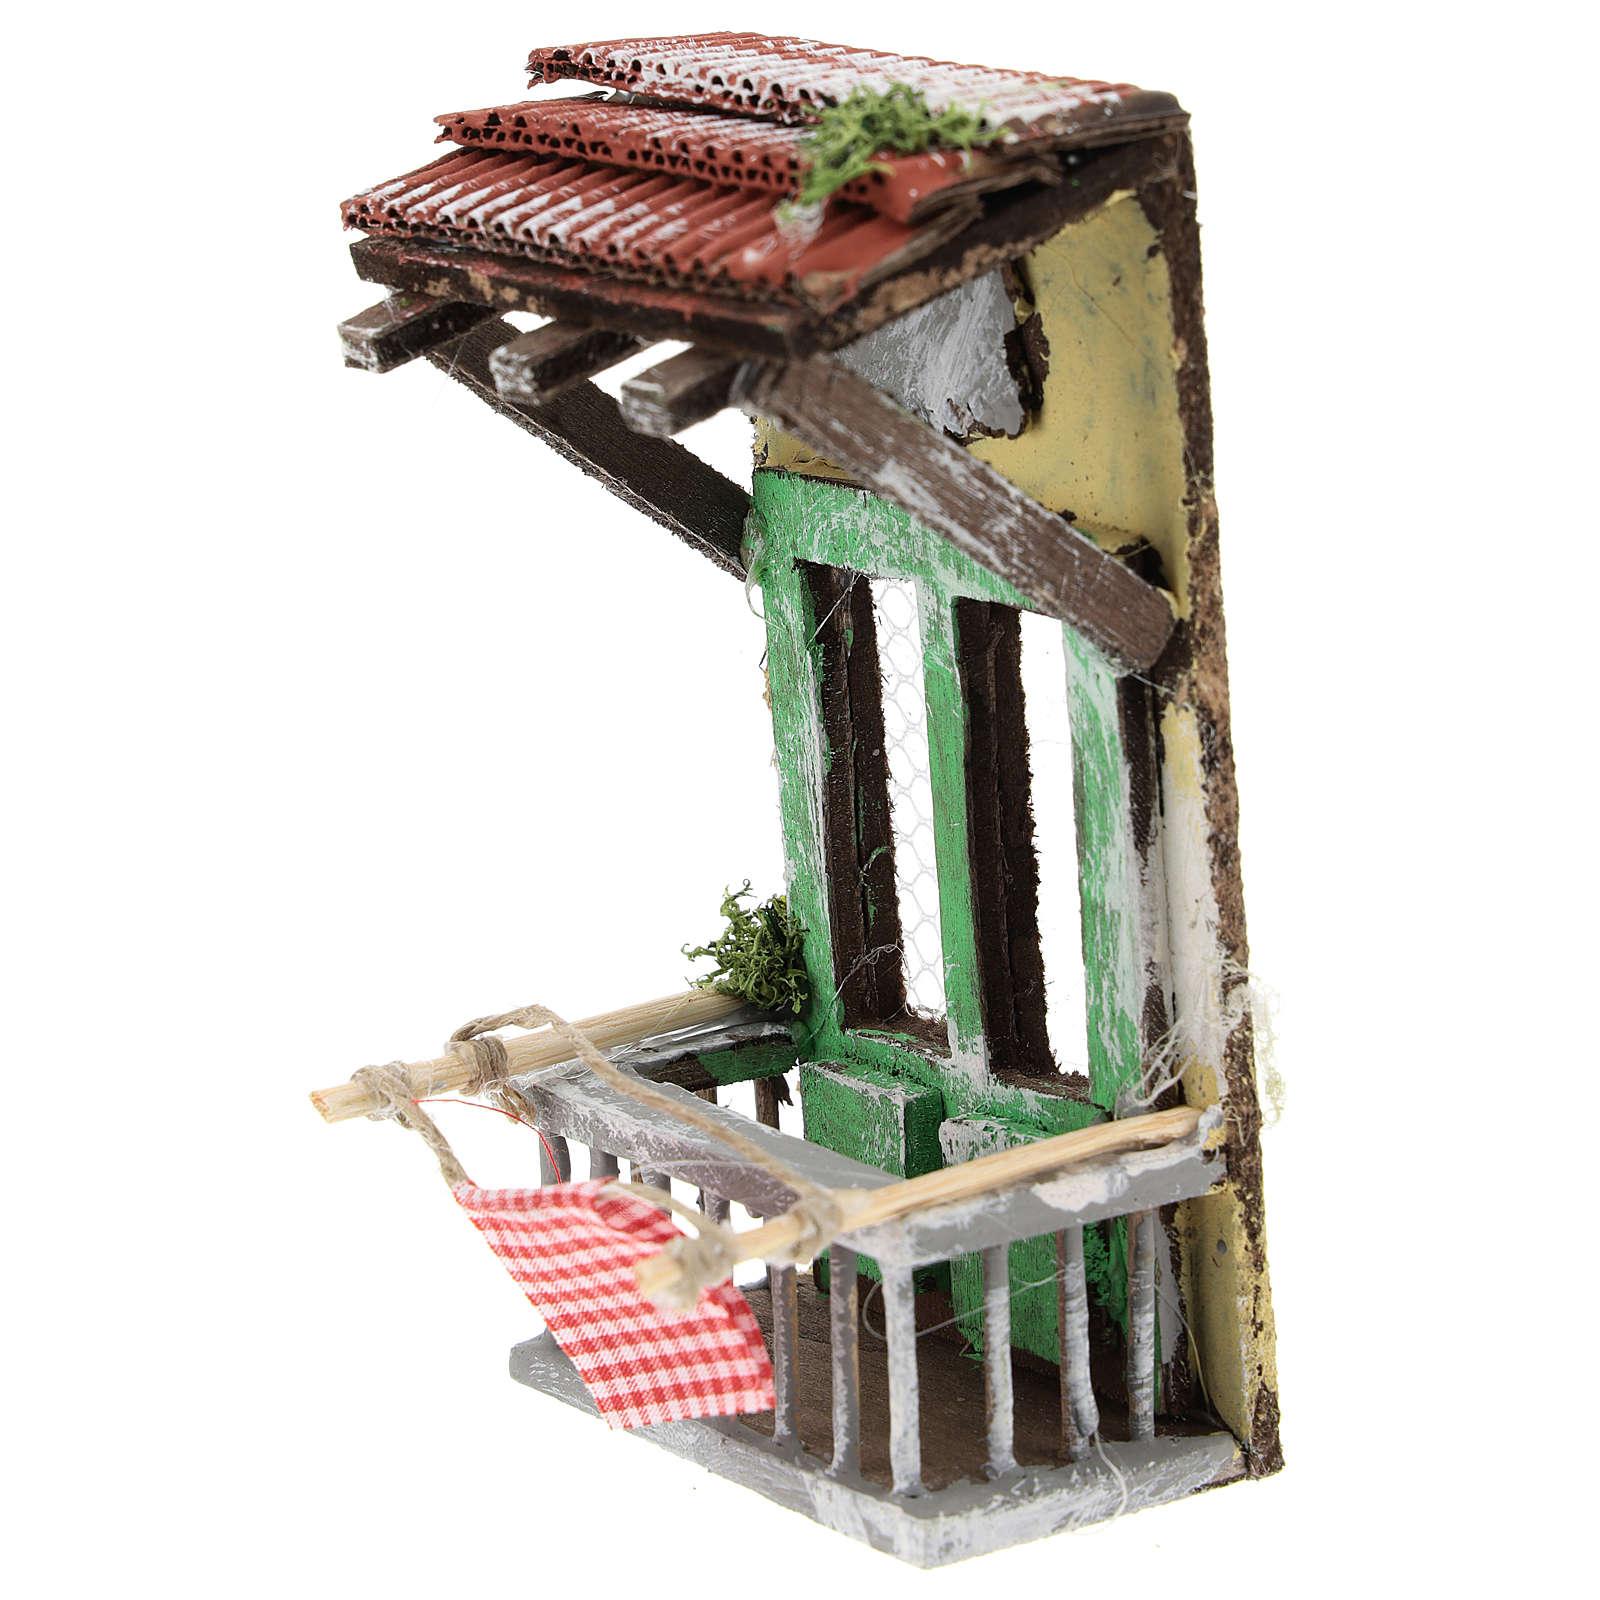 Balcony with canopy for Neapolitan Nativity Scene of 6-8 cm 4